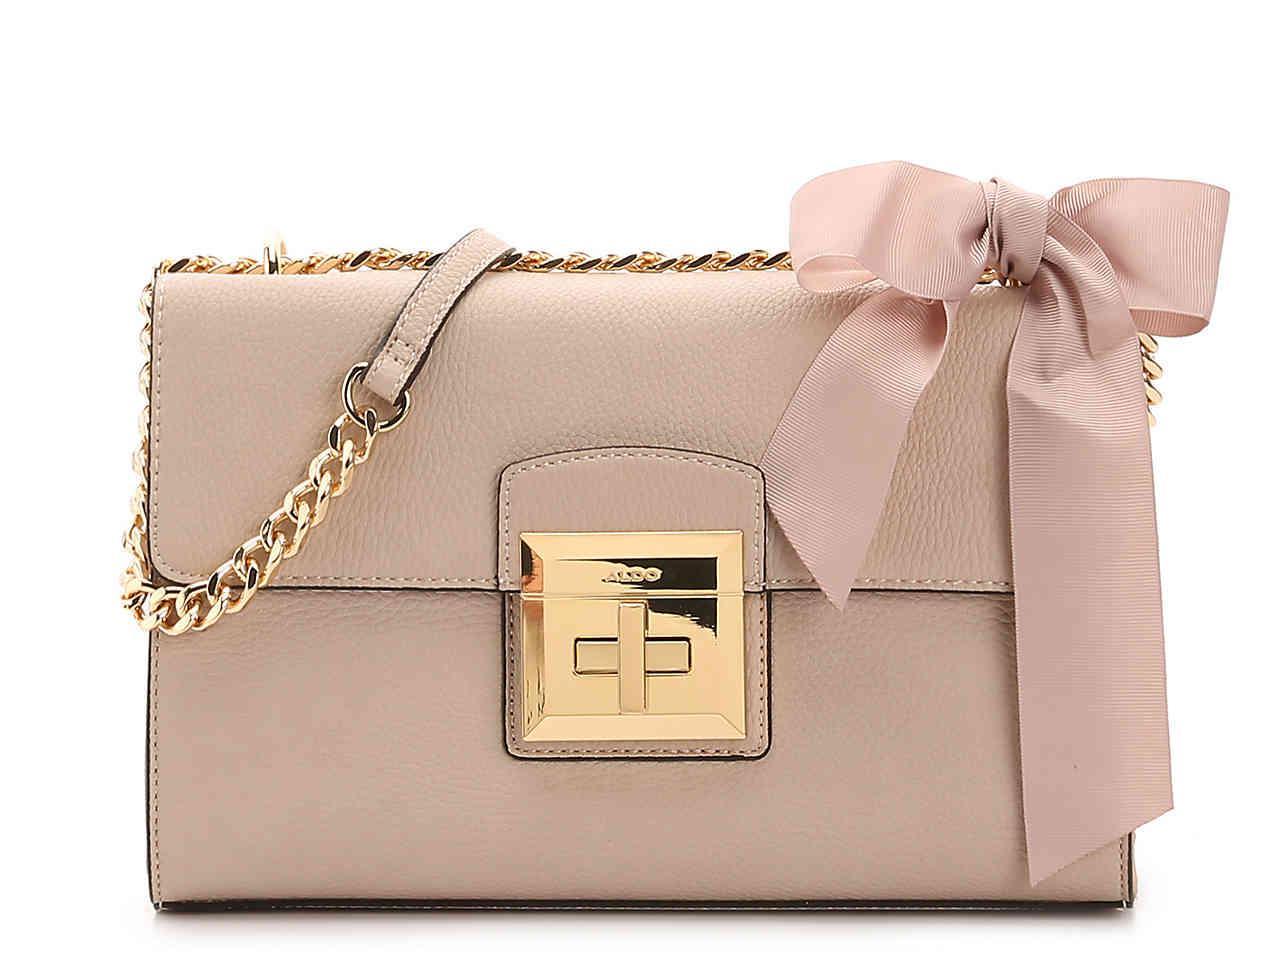 ALDO Maenia Crossbody Bag in Nude (Natural) - Lyst